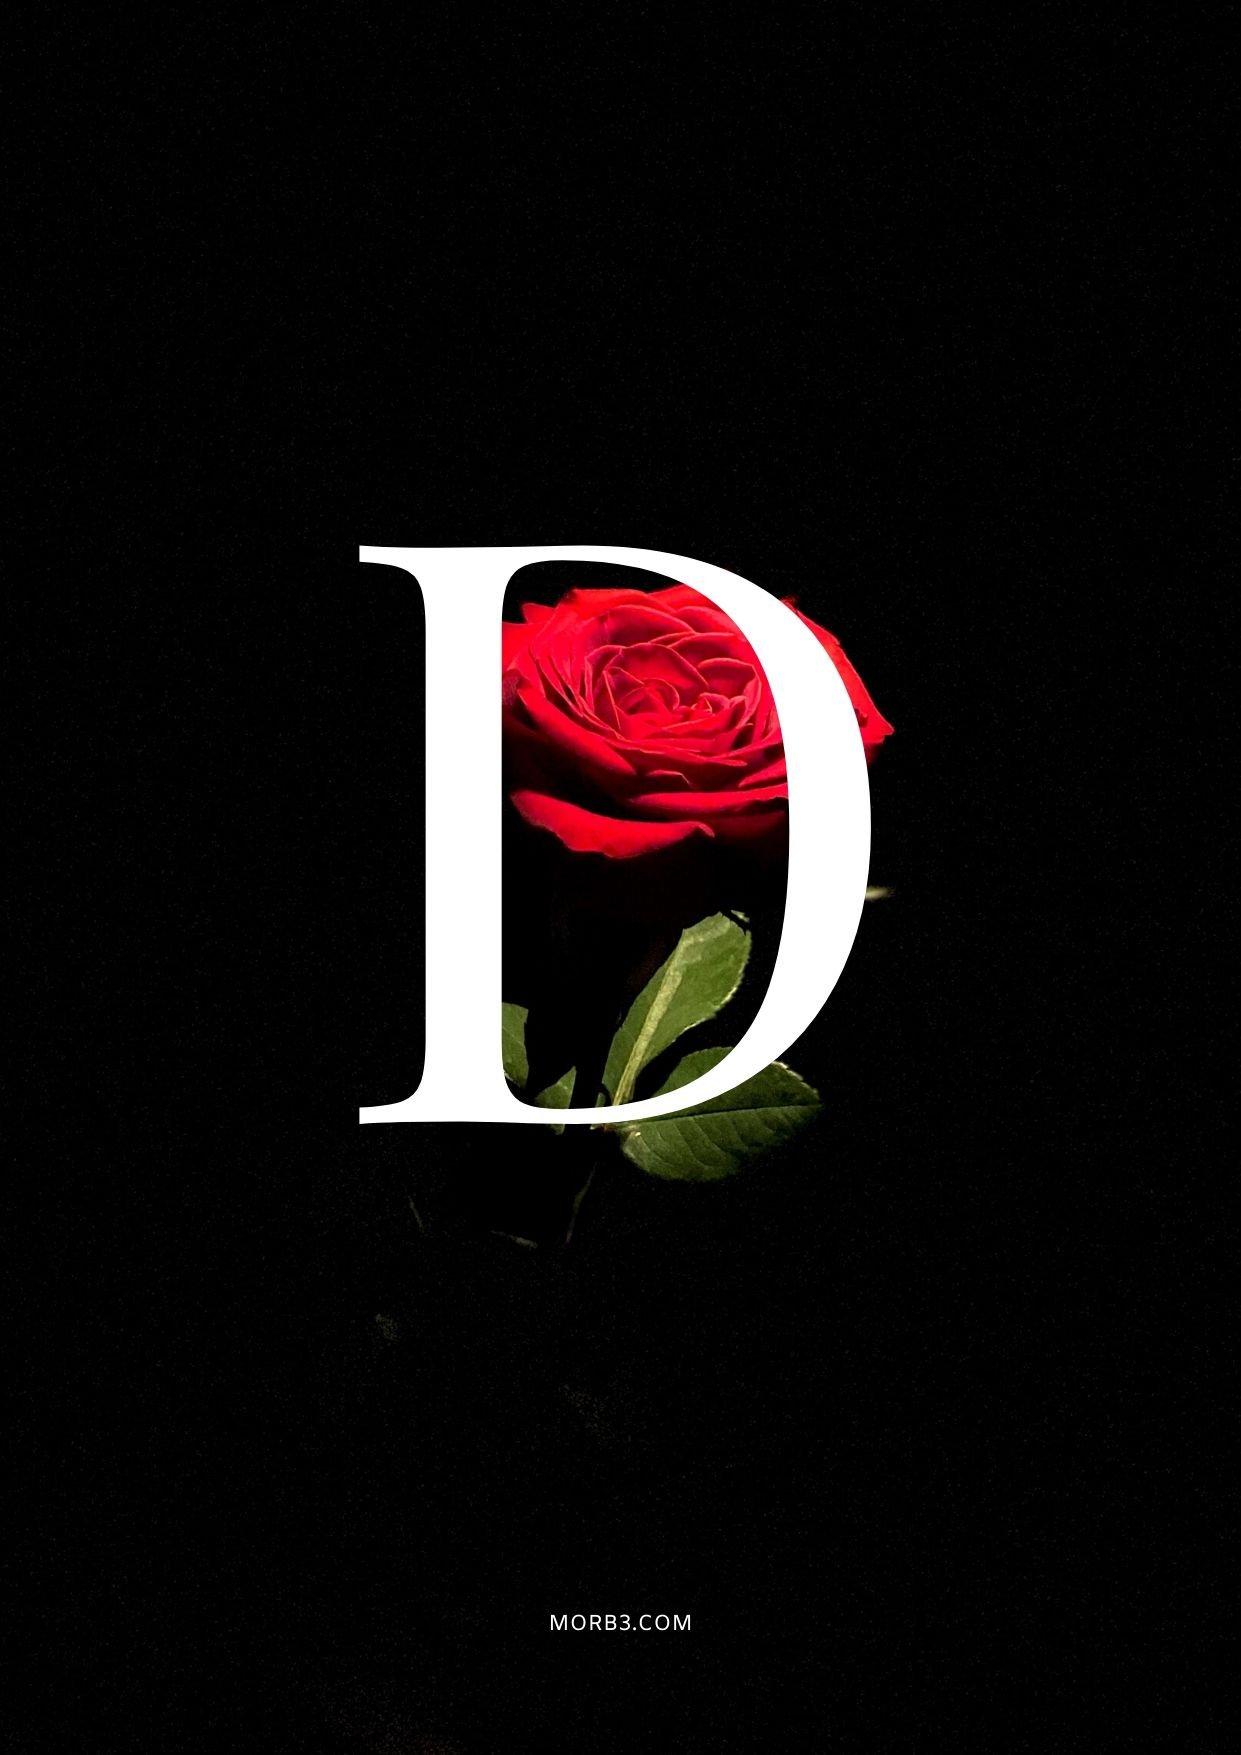 صور حرف D خلفيات حرف D خلفيات حرف D رومانسية اجمل حرف D في العالم حرف D بالورد حرف D احبك حرف D في قلوب حرف D مع كلام حب خلفيات حرف